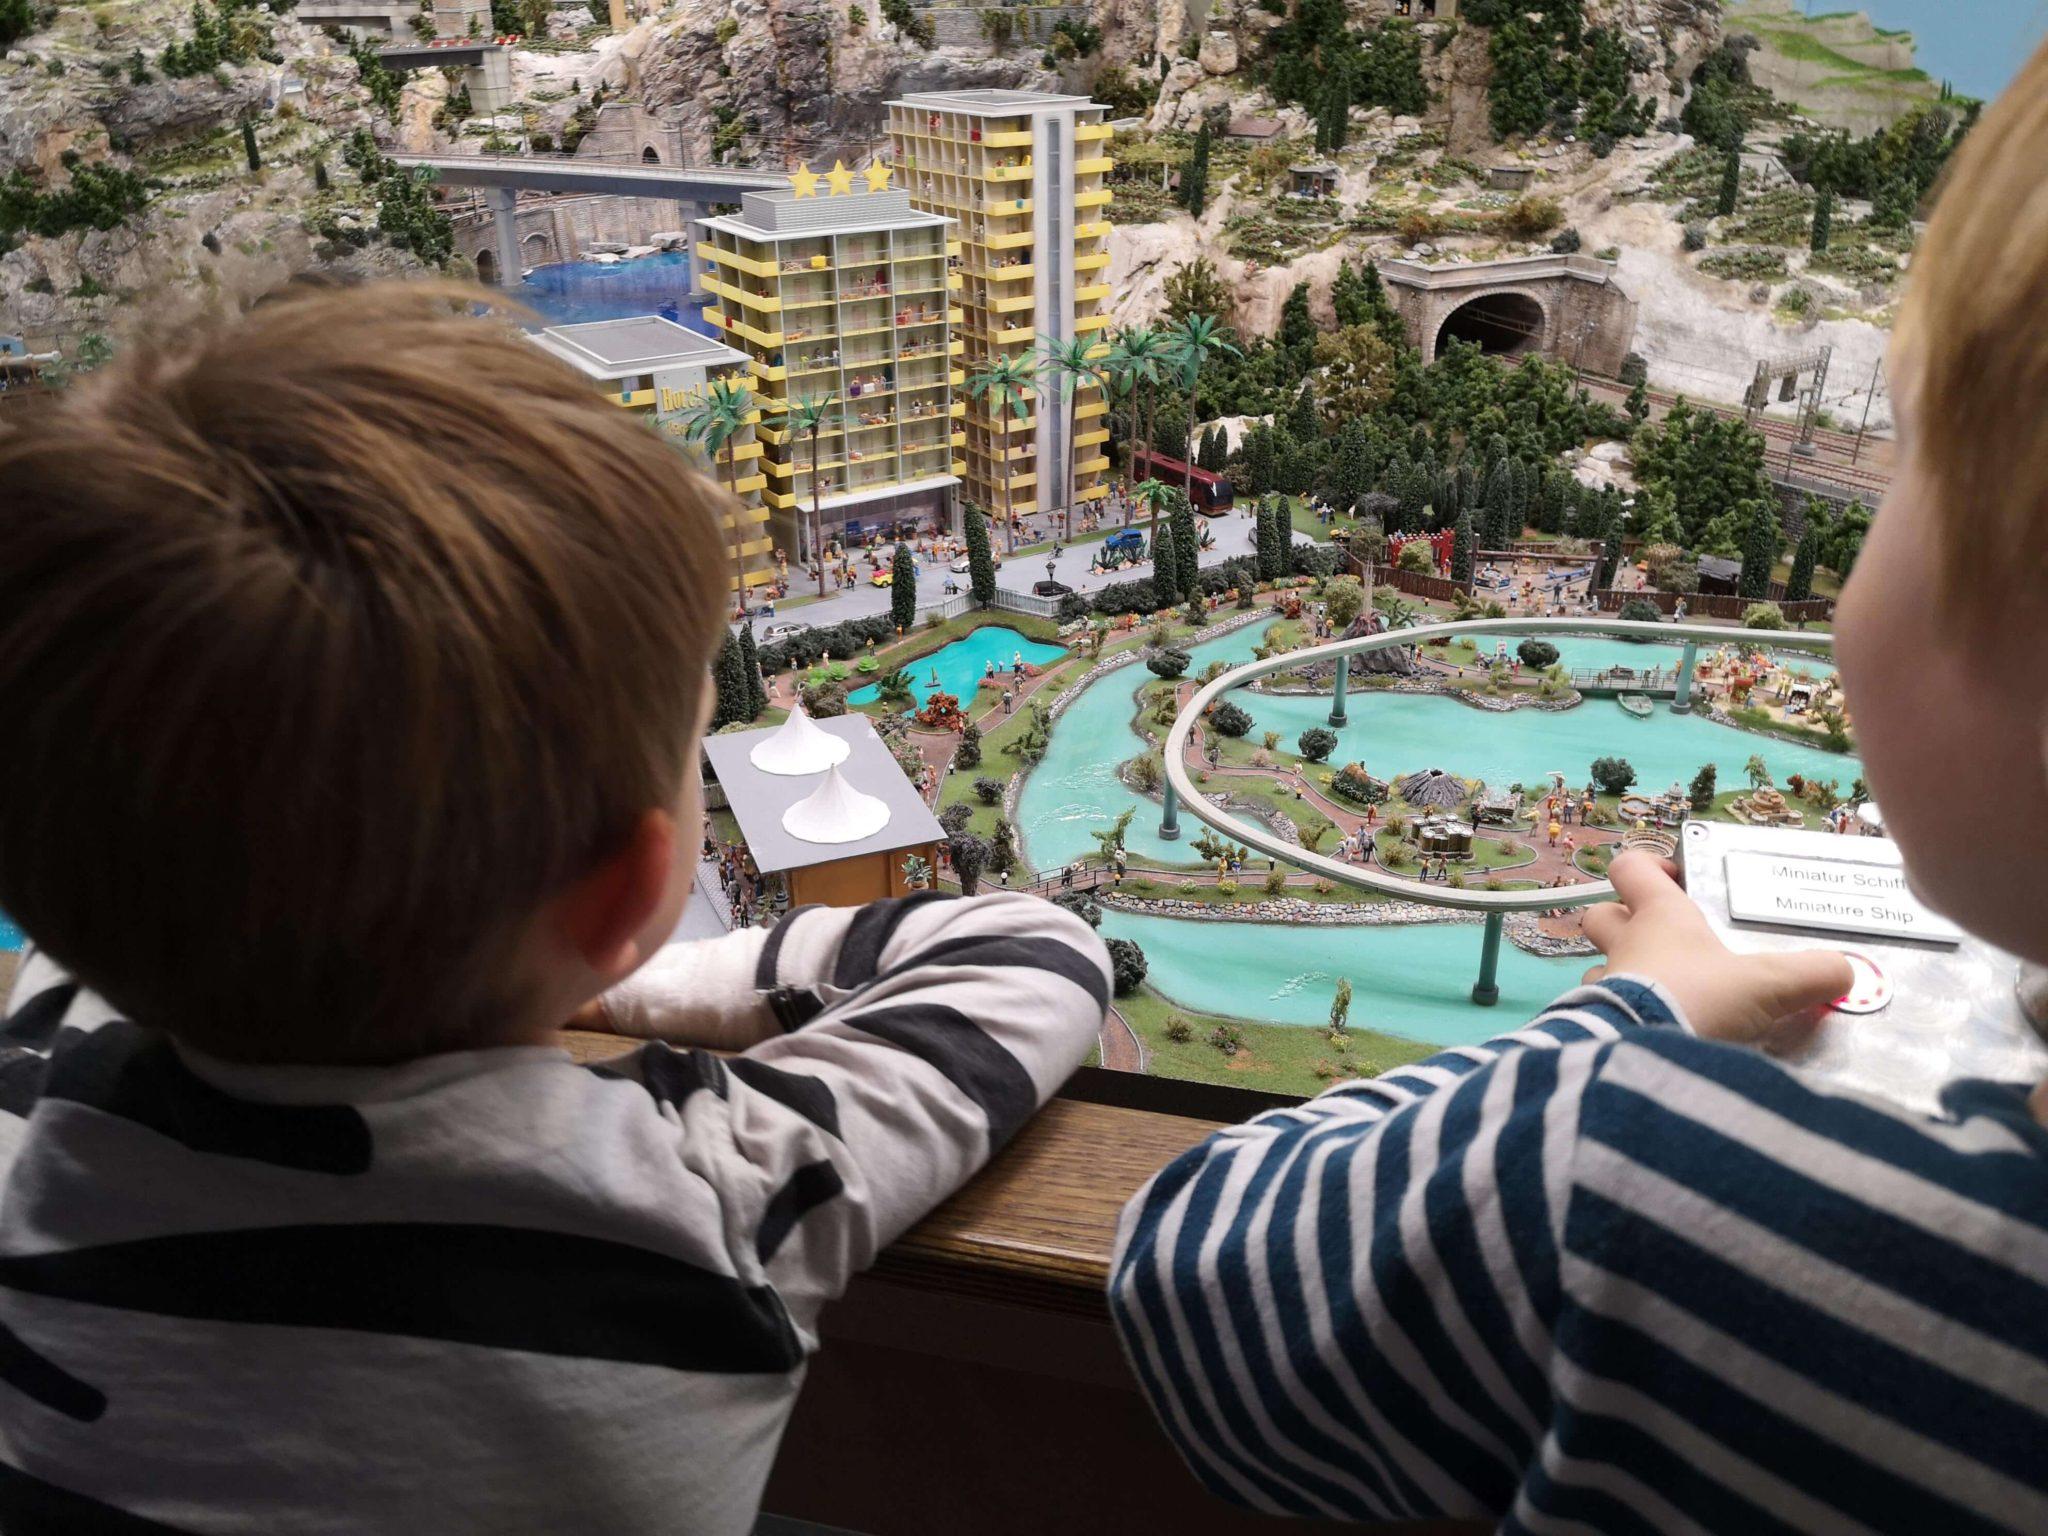 Ausflugstipp Hamburg Miniaturwunderland - Frankfurt mit Kids